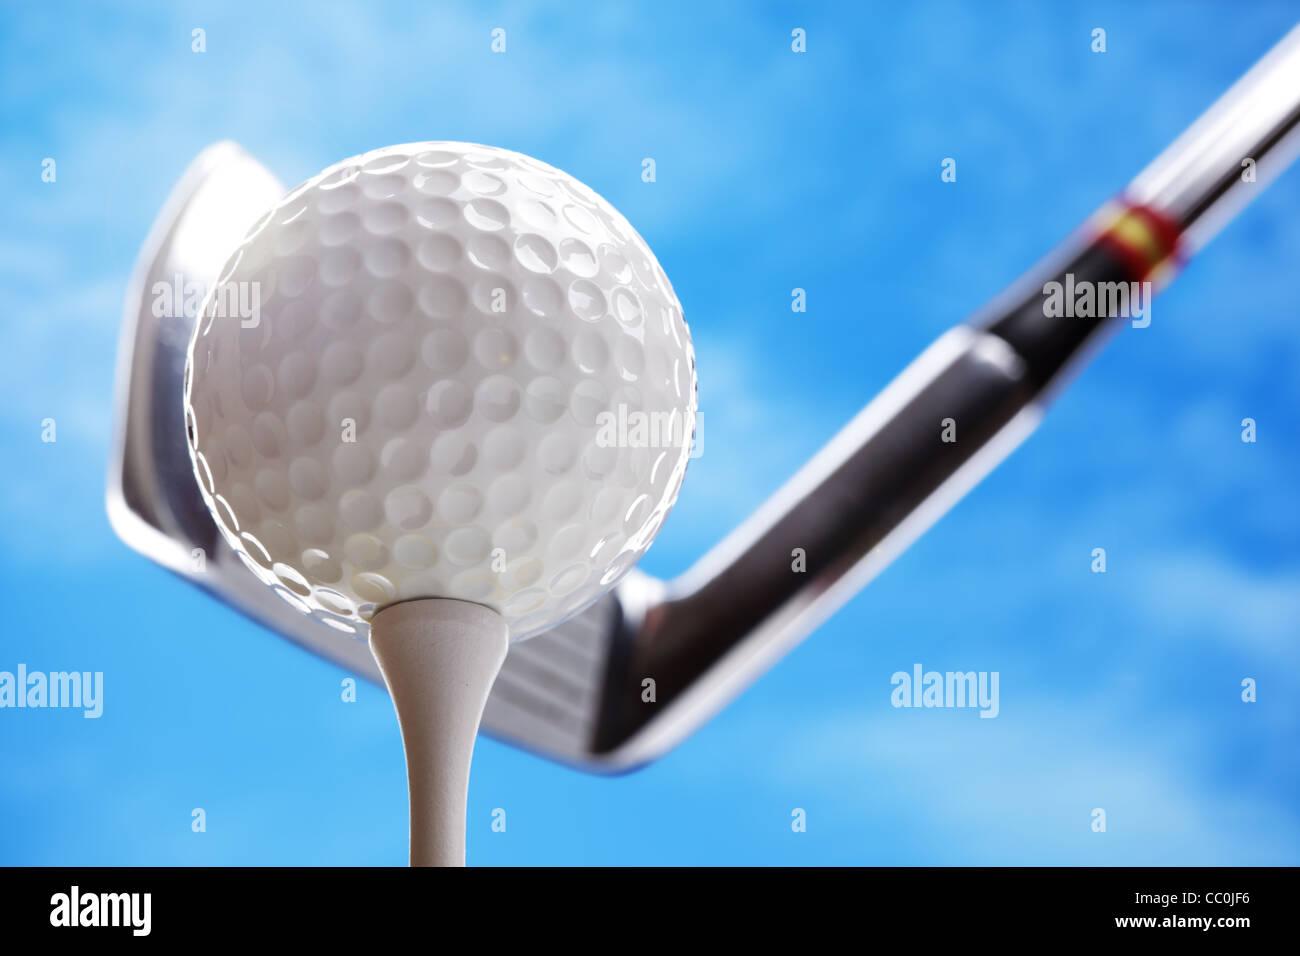 Balle de golf et club Photo Stock